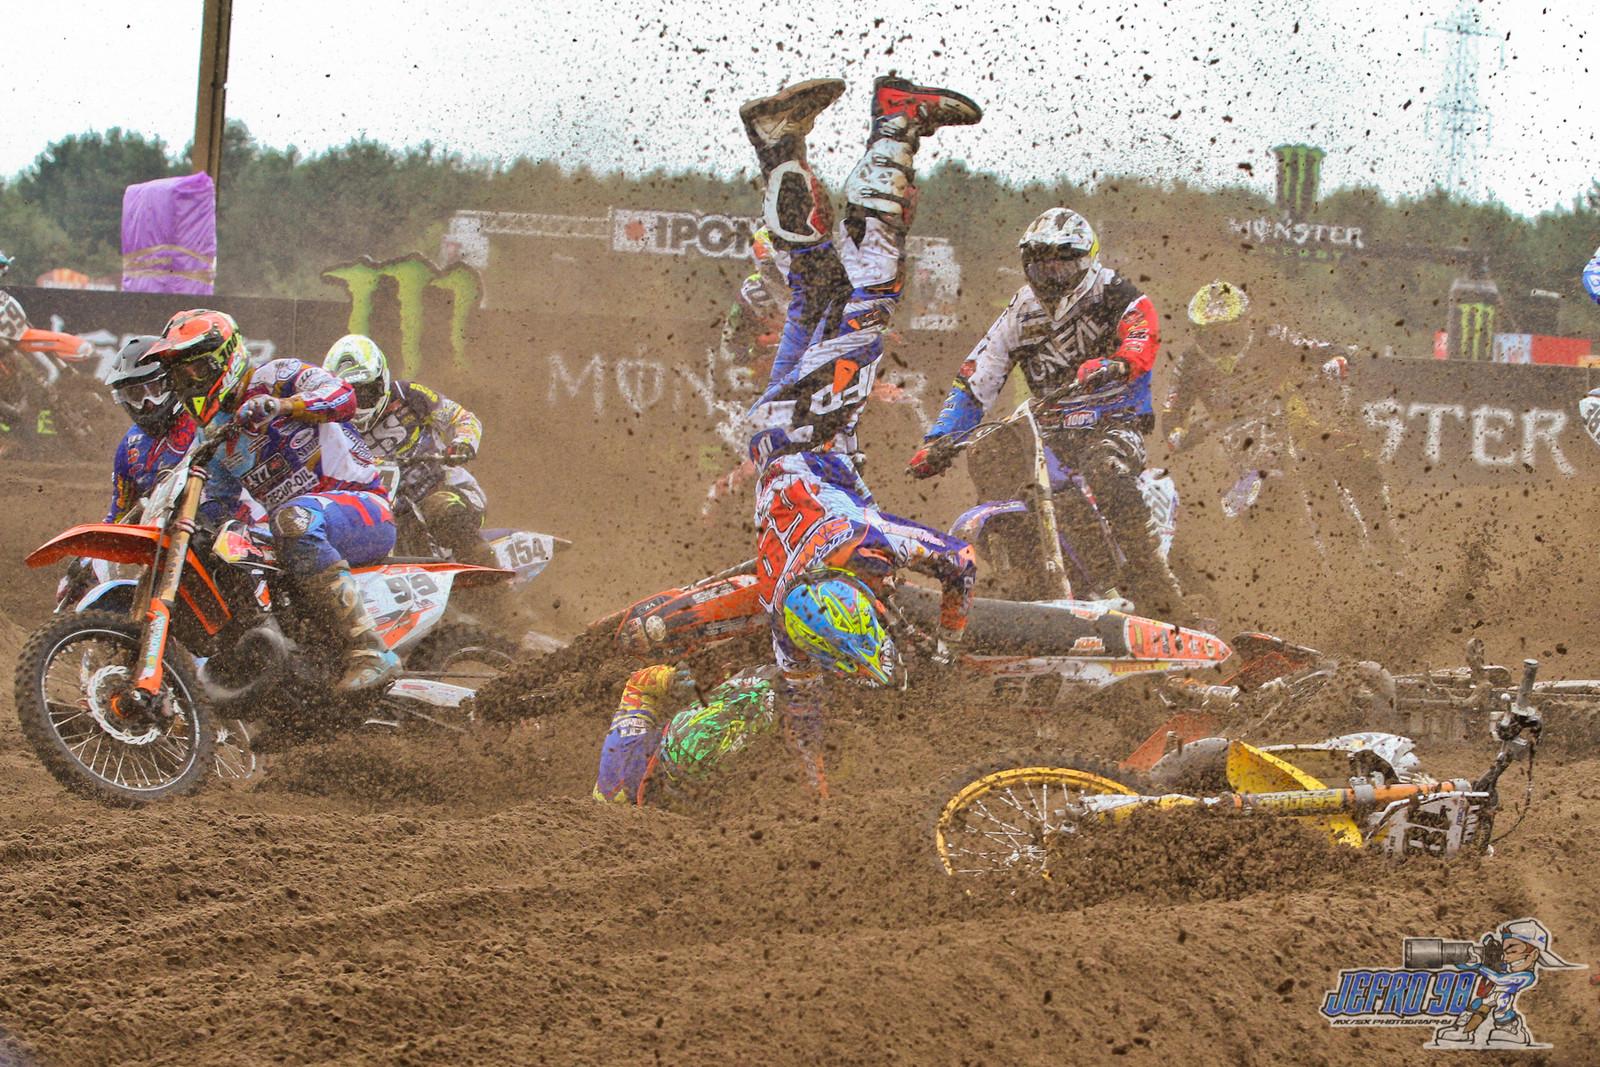 EMX300 - Photo Gallery: MXGP of Limburg - Motocross Pictures - Vital MX